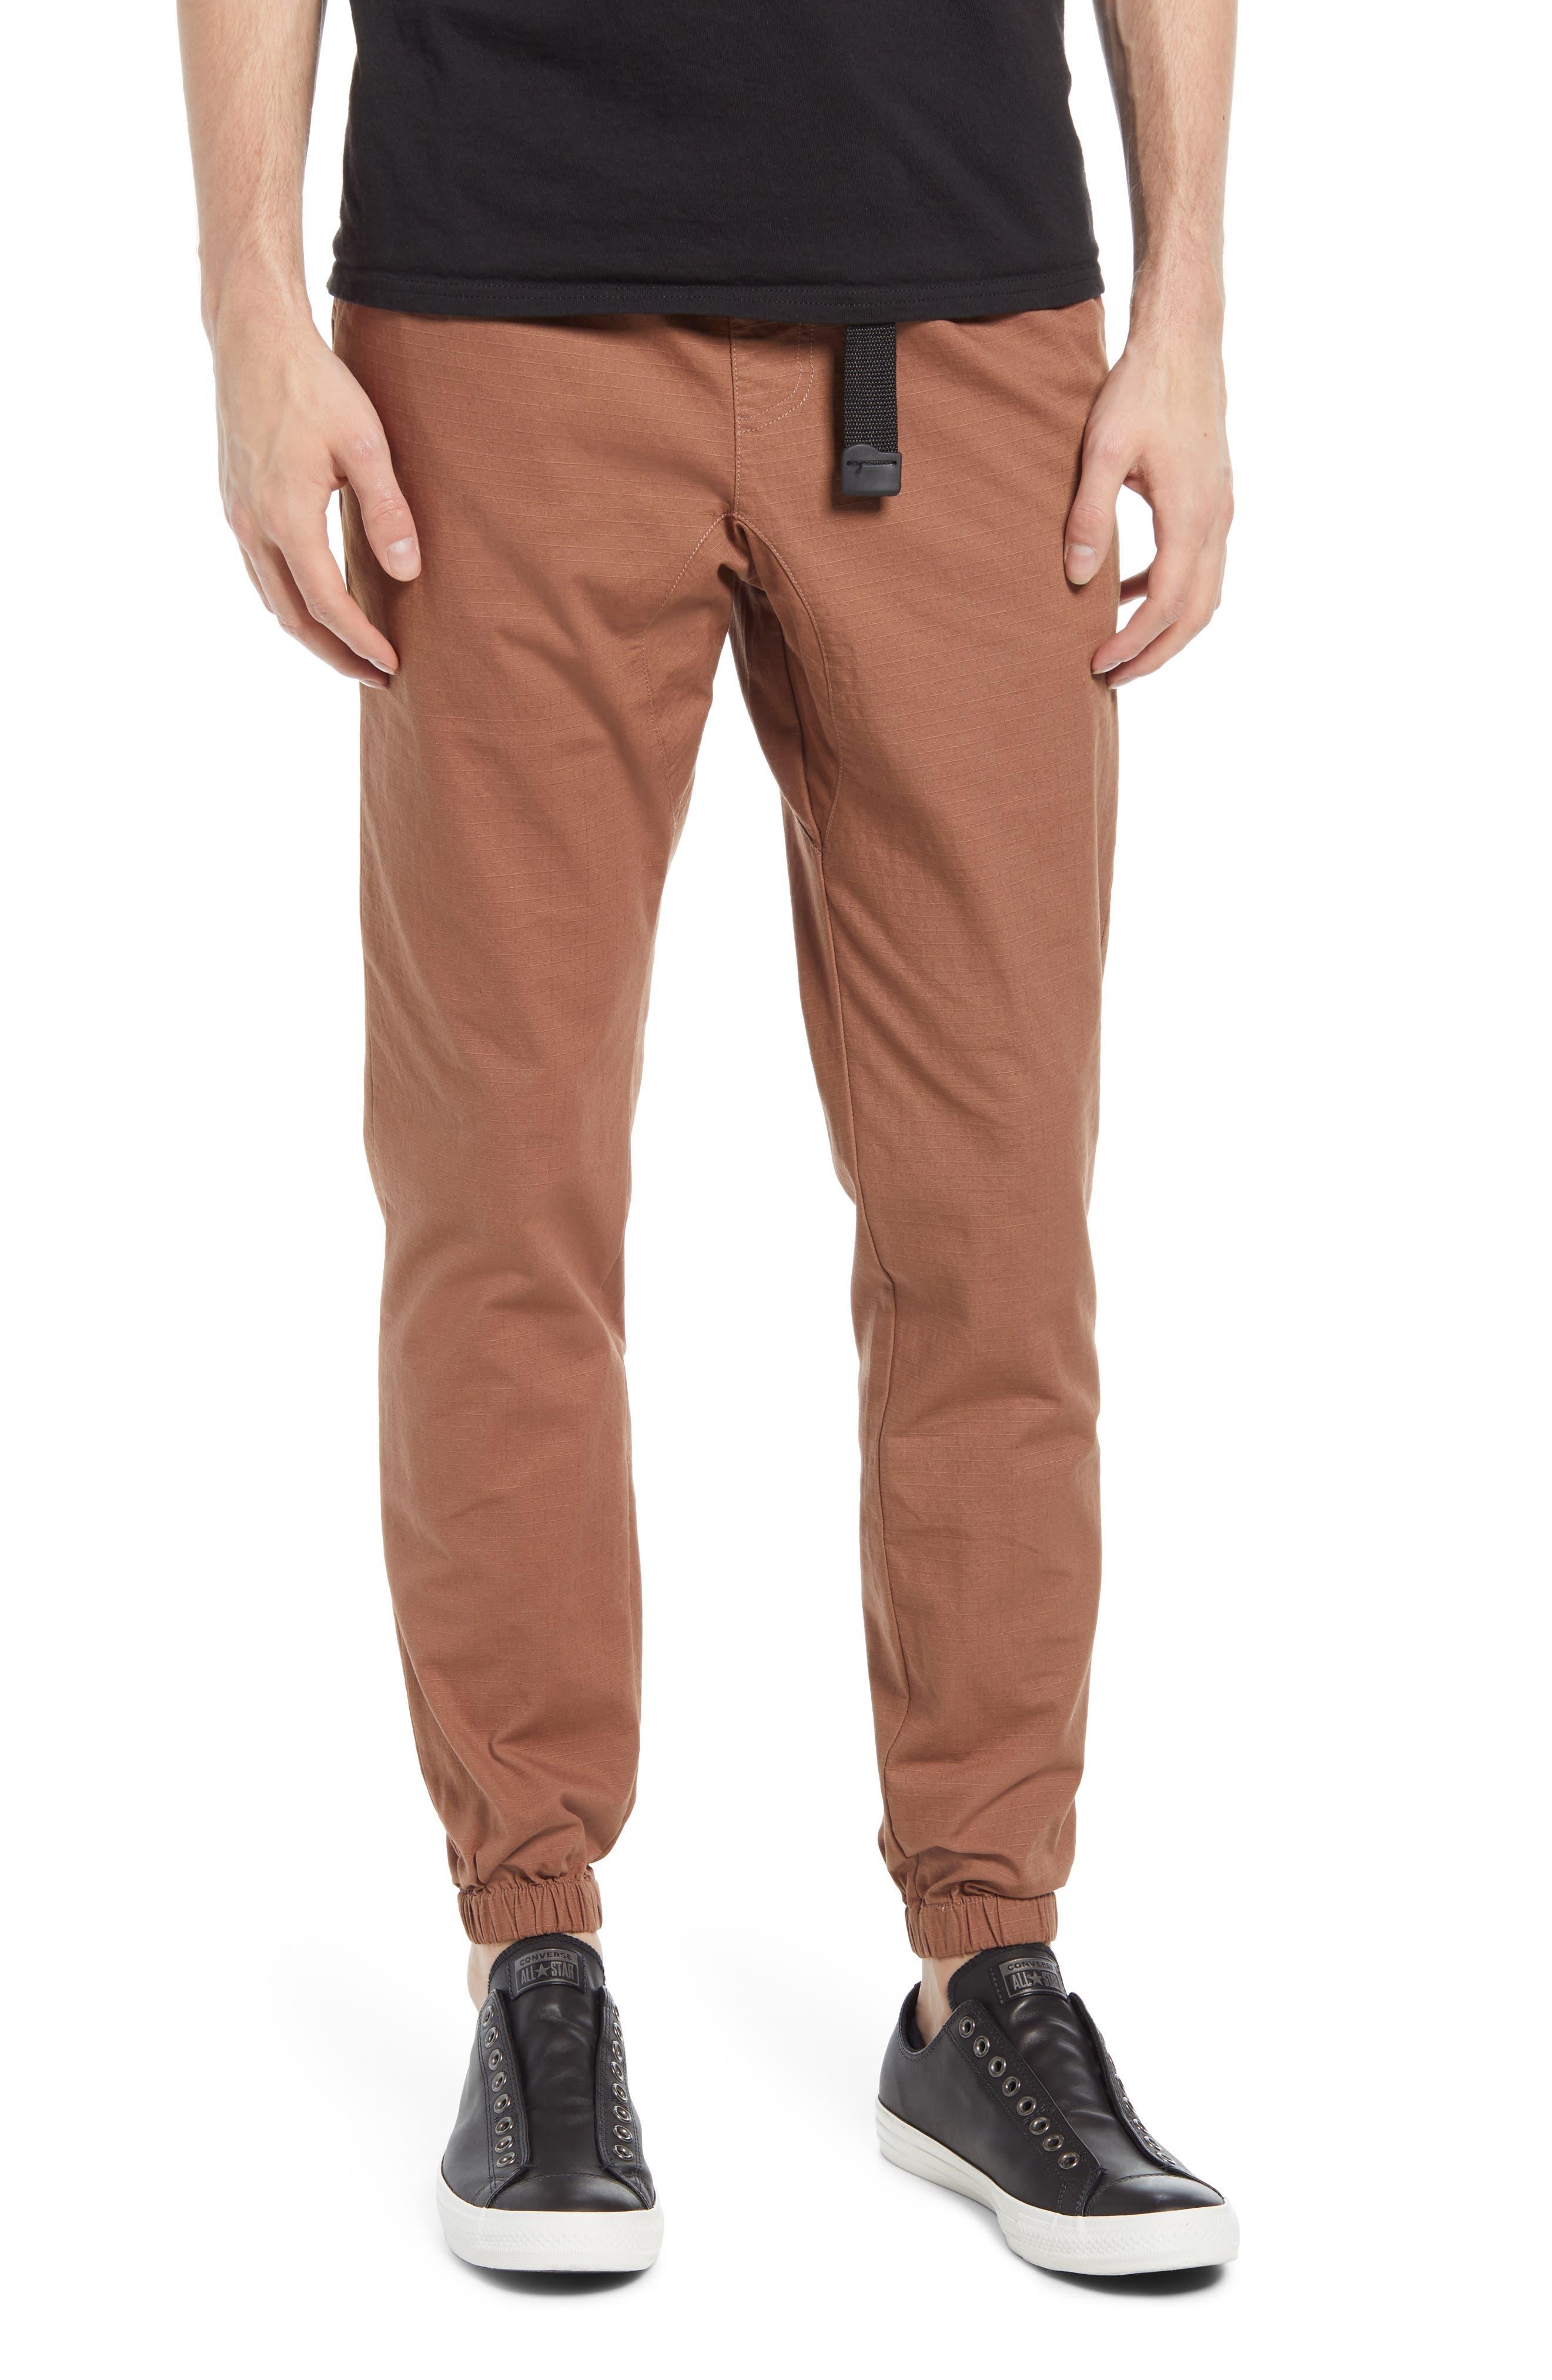 Lira Clothing Men's Lira Clothing Northrop Ripstop Joggers, Size Large - Beige